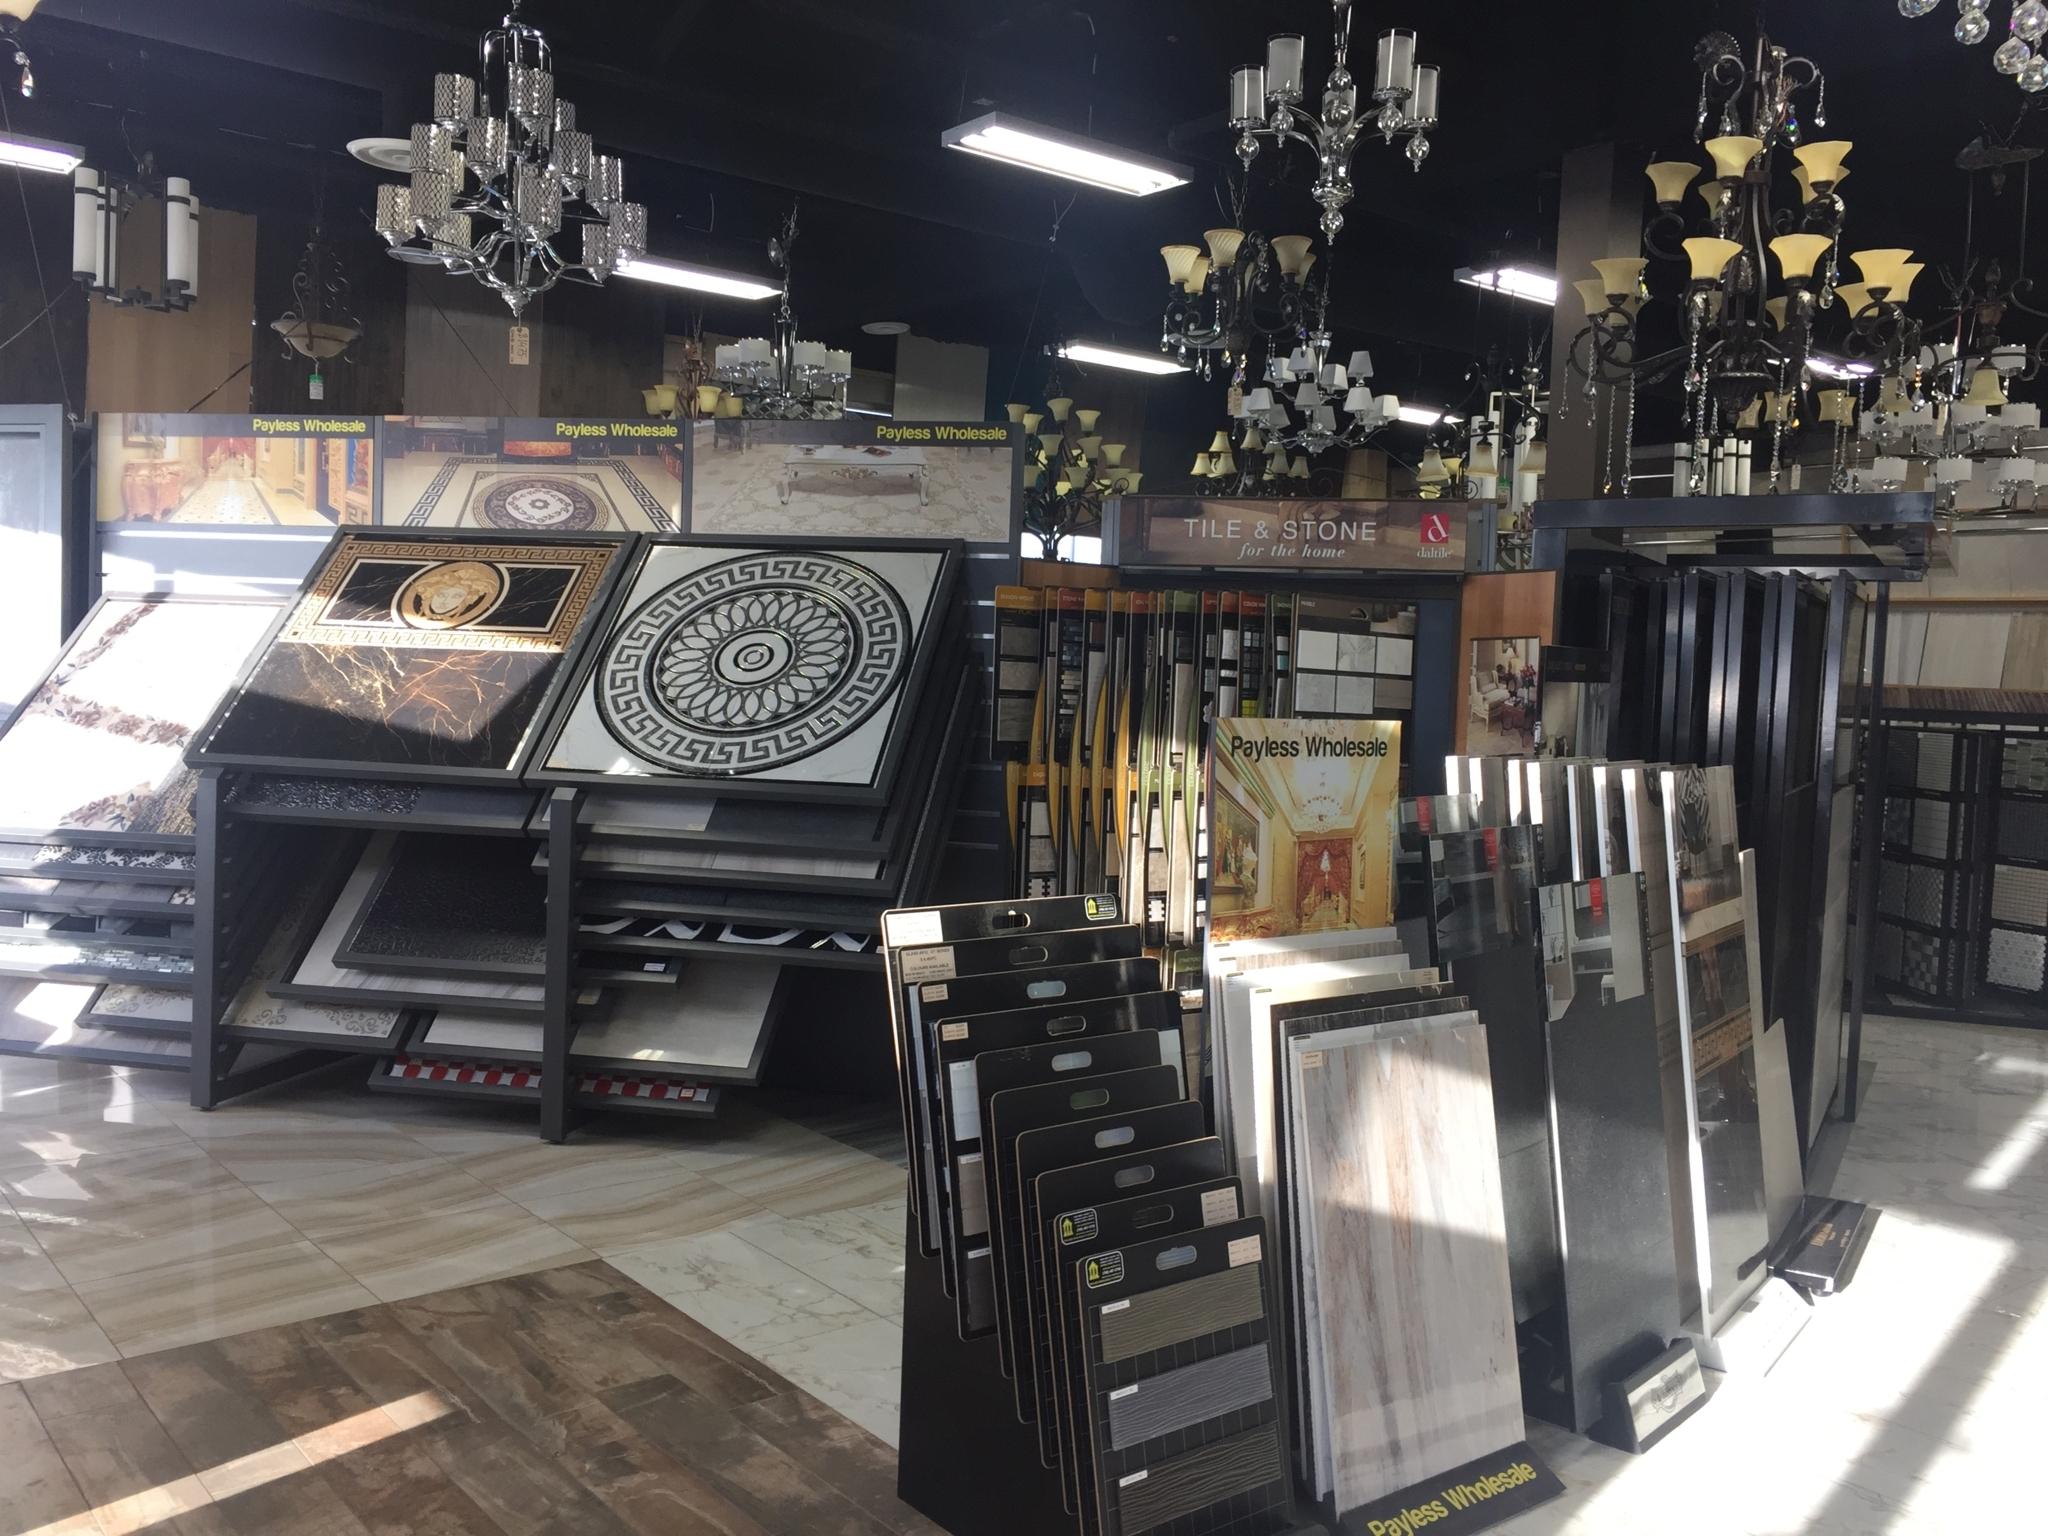 Payless Wholesale Flooring & Lighting Plus Inc in Edmonton: VERSACE HOME DECOR ROBERTTO CAVALLI DESIGN  LAMBORGHINI DECOR TILES